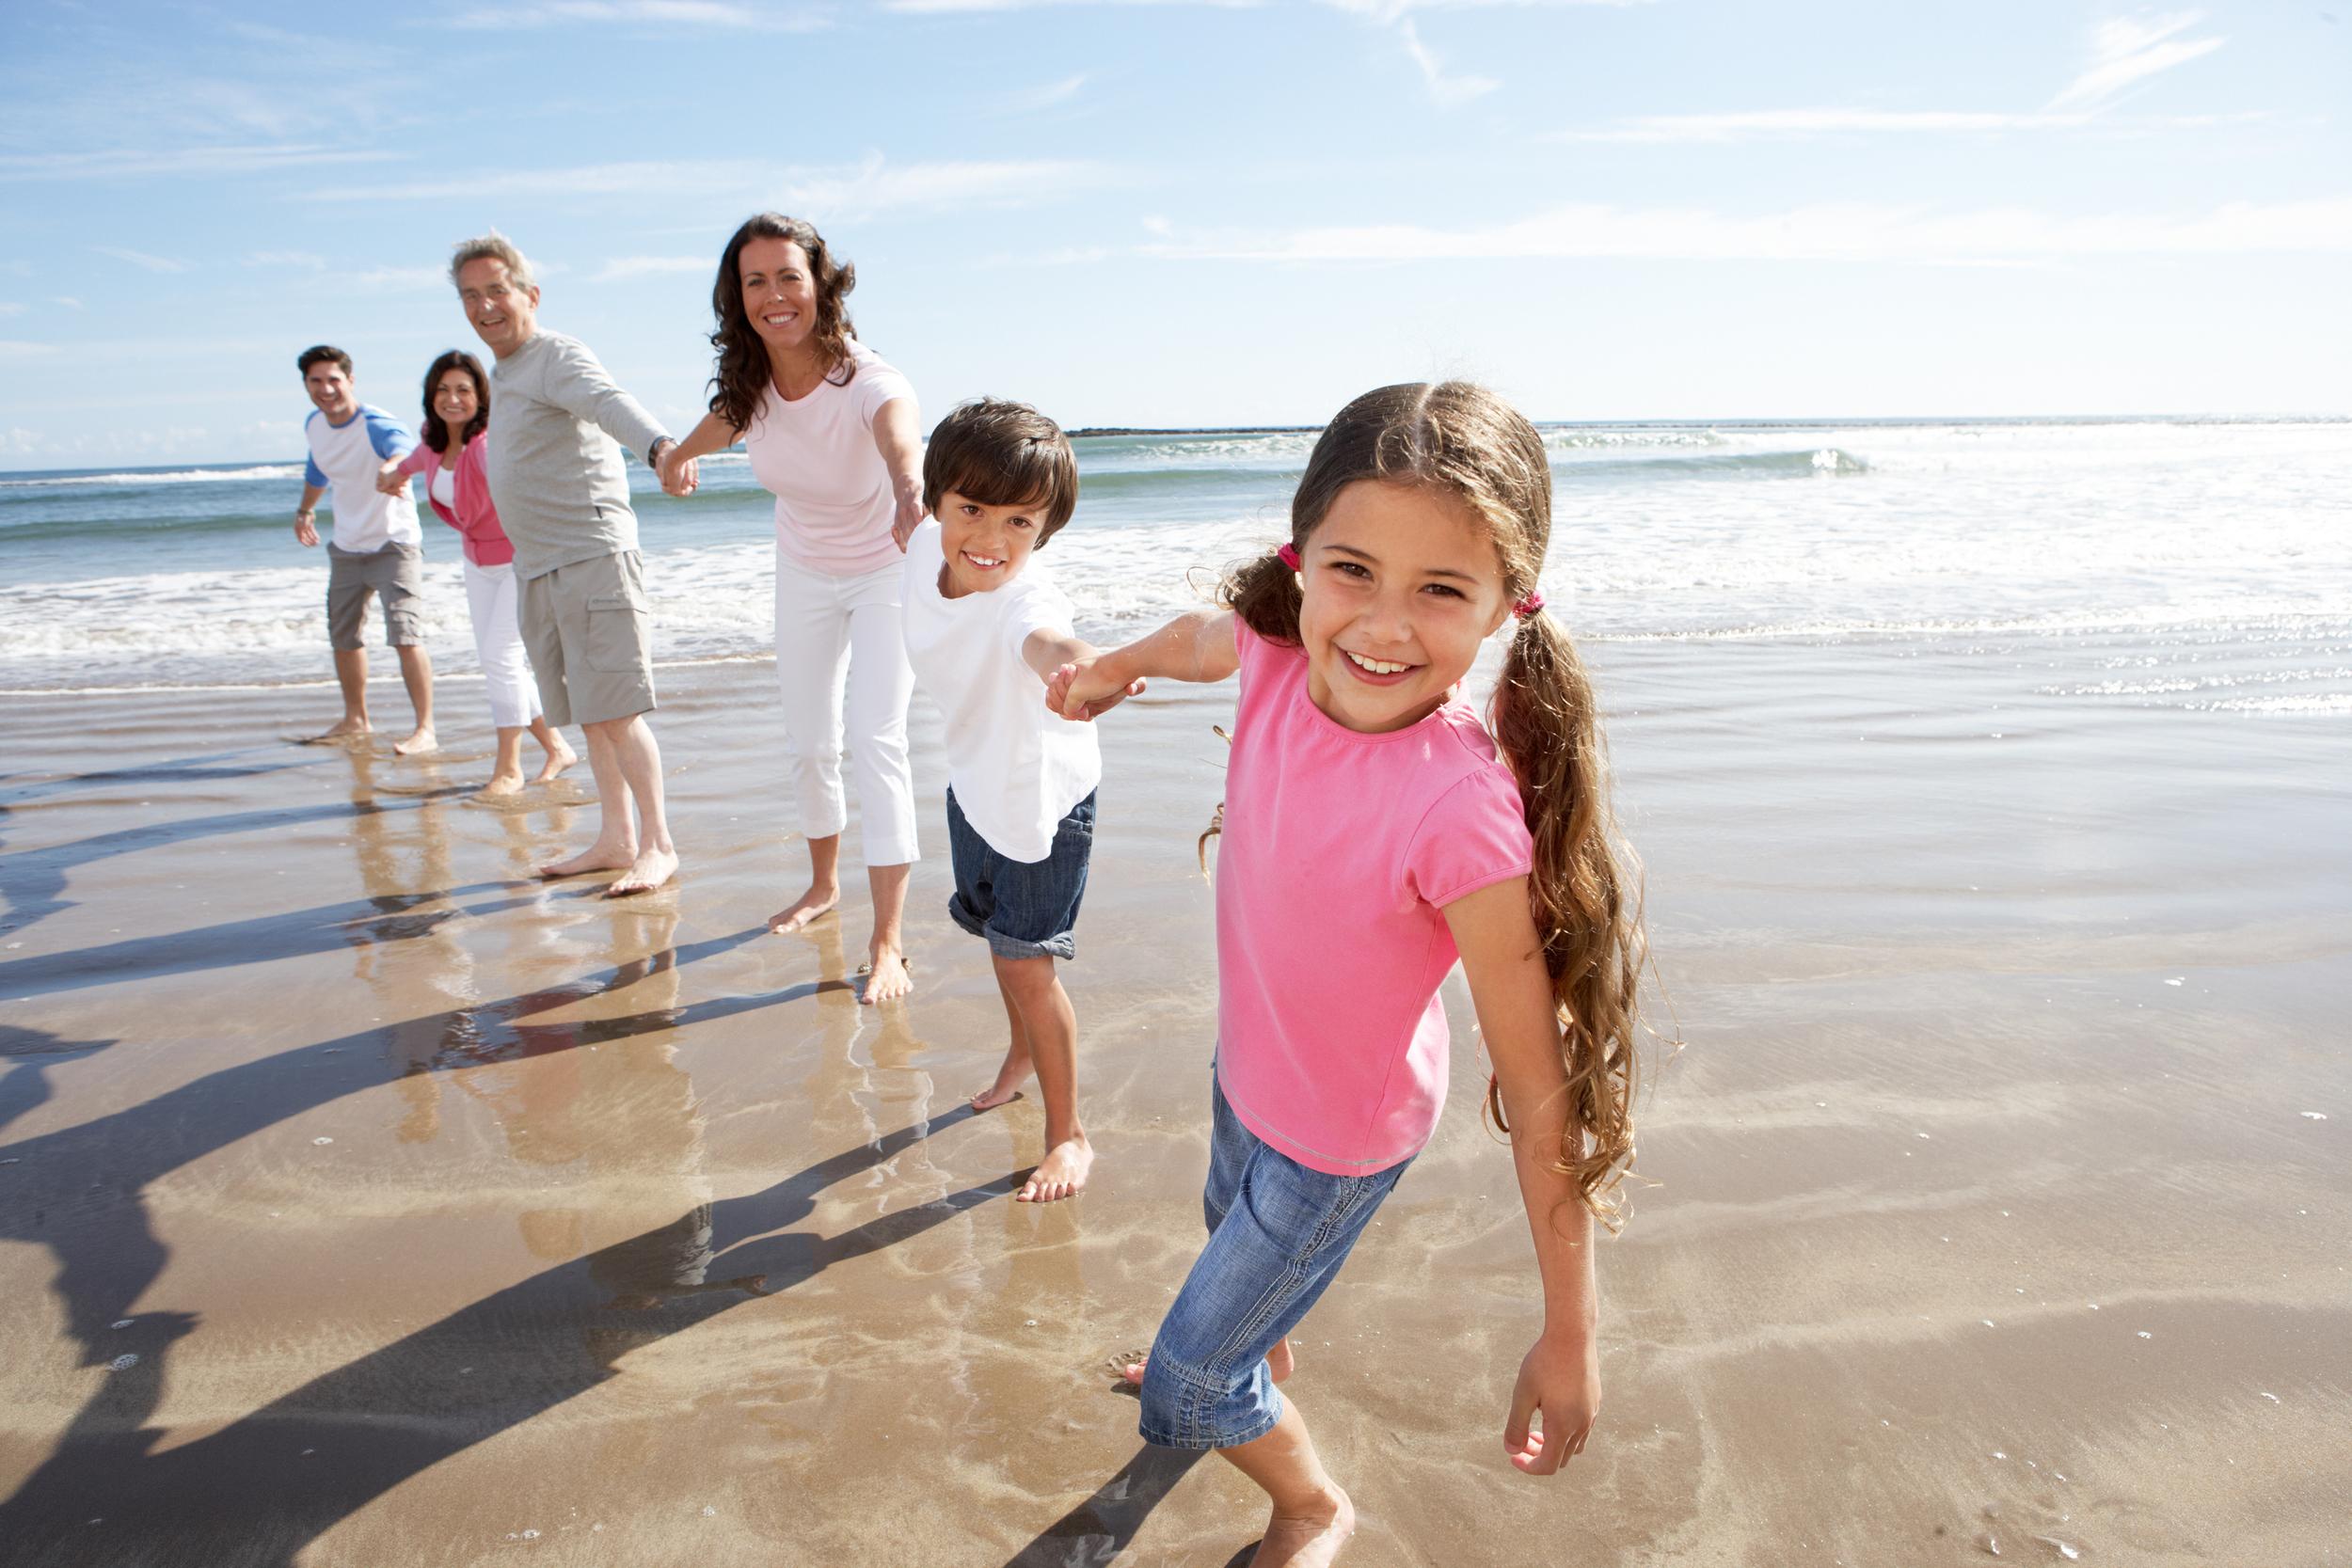 bigstock-Multi-Generation-Family-Having-50069567.jpg